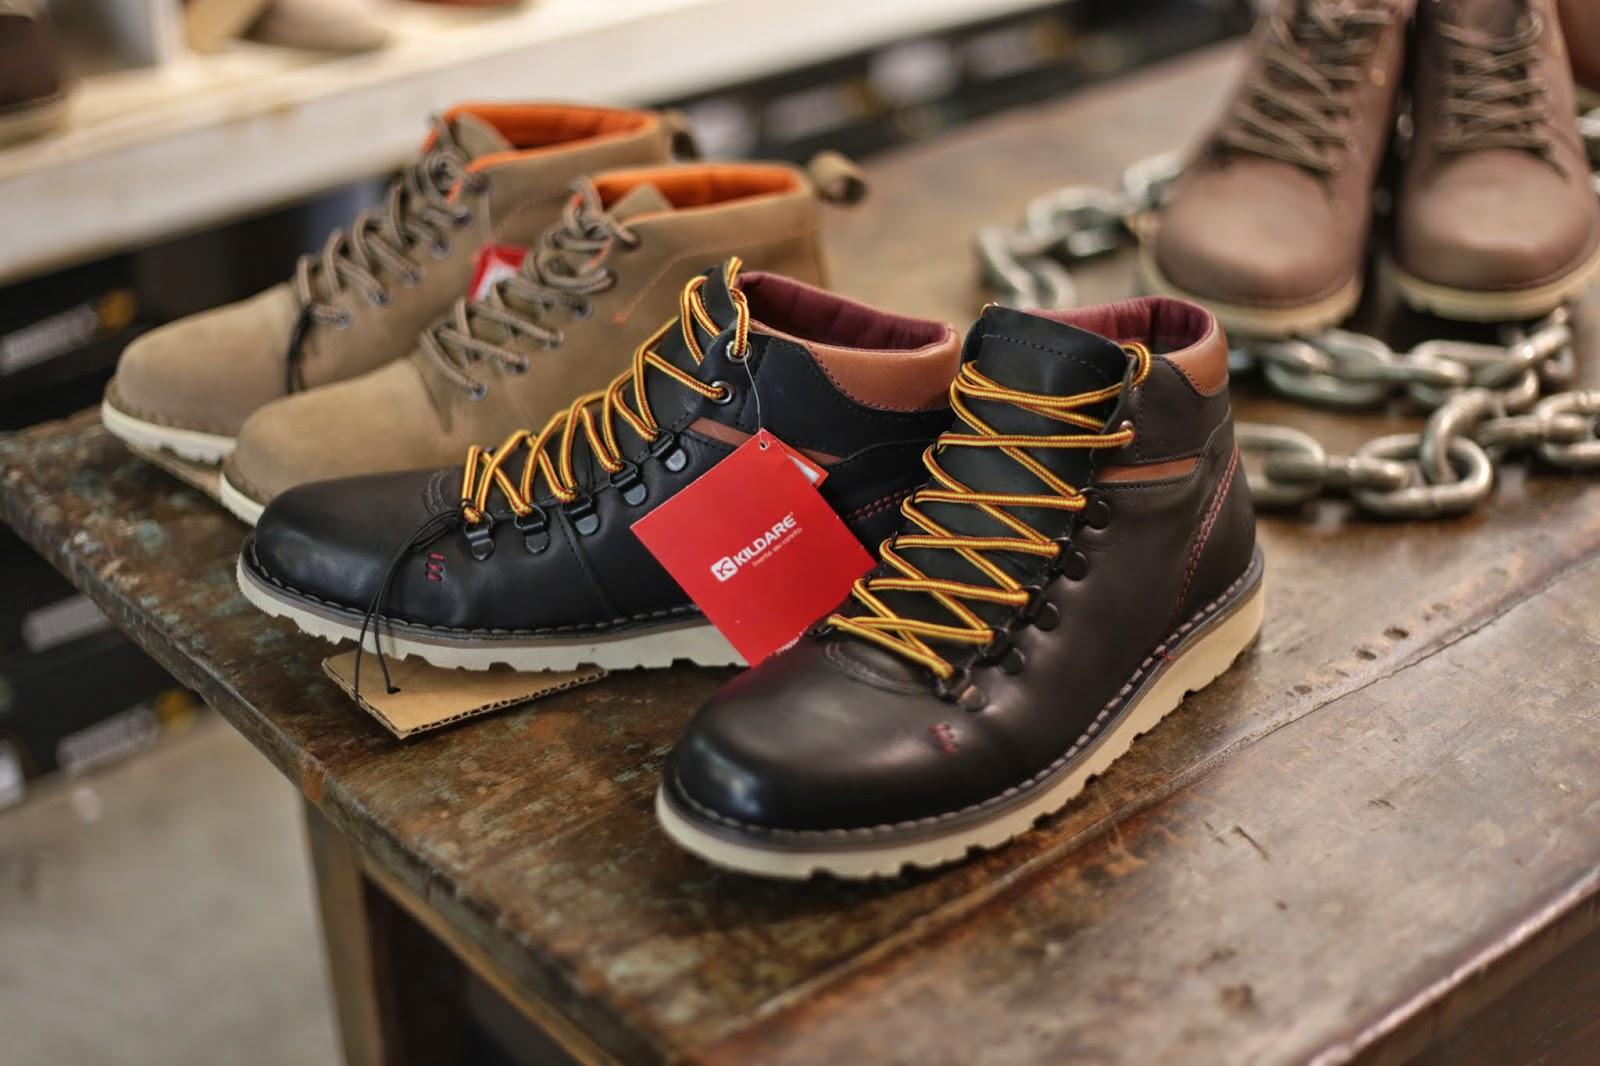 botas timberland novas